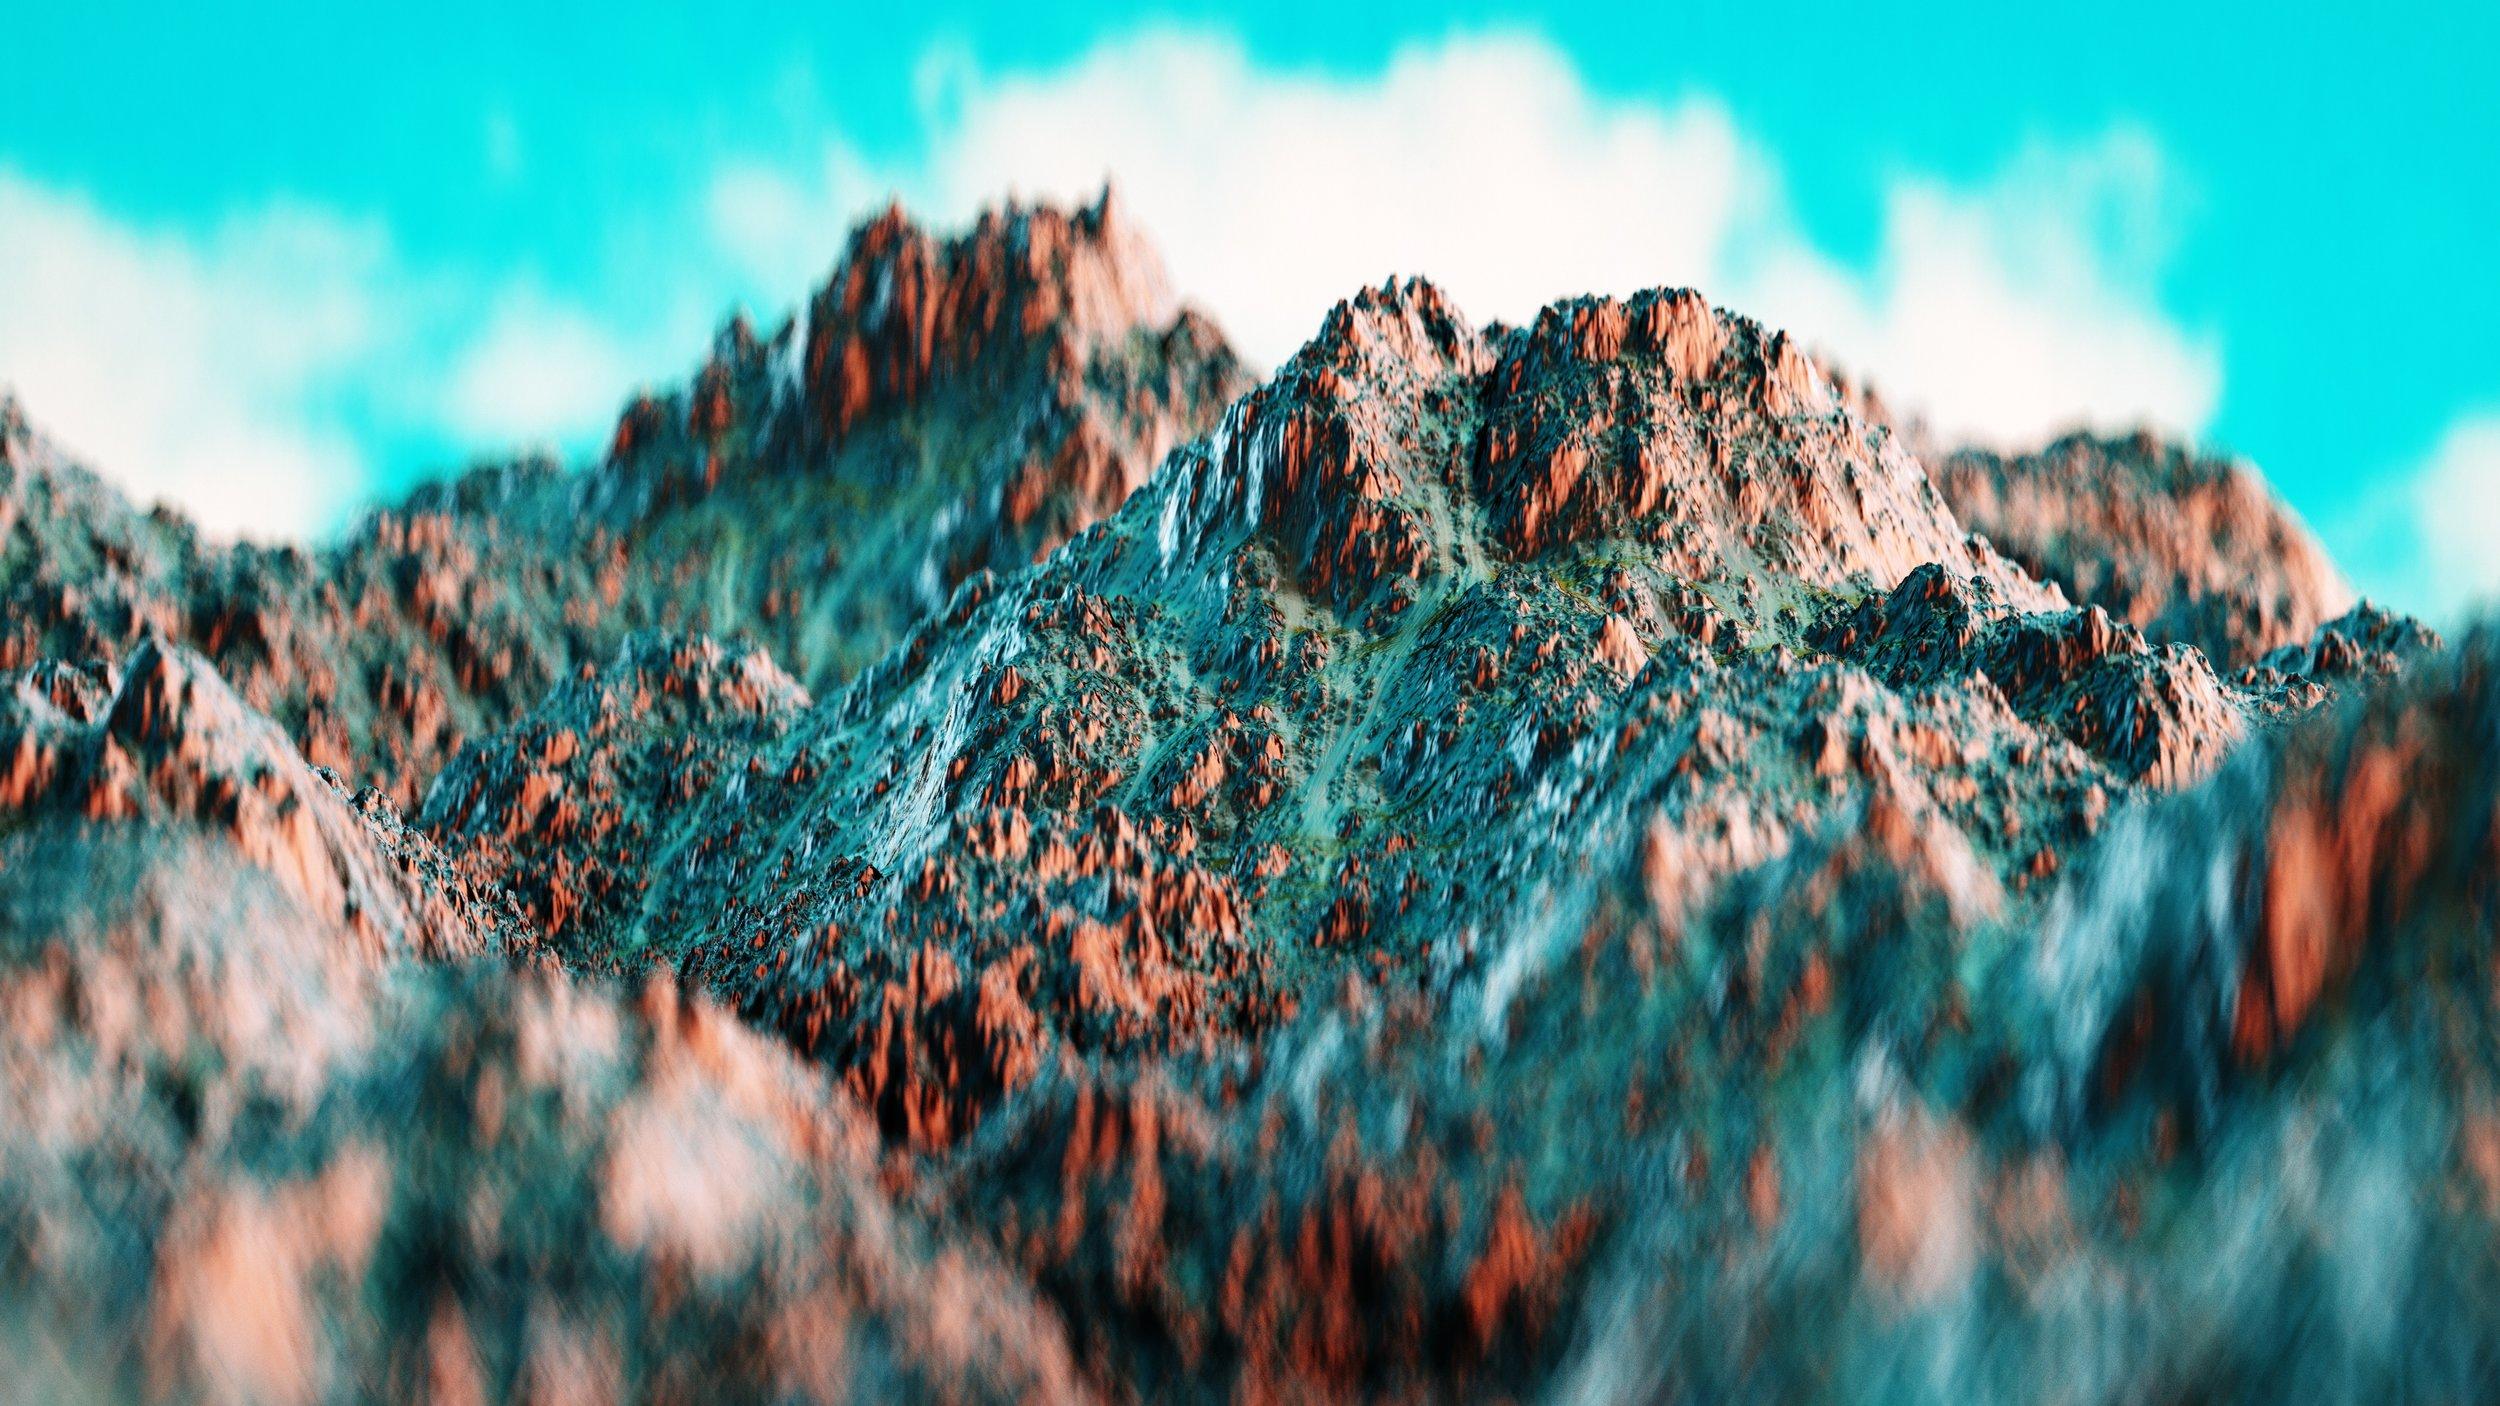 World Machine_01_v0001.jpg